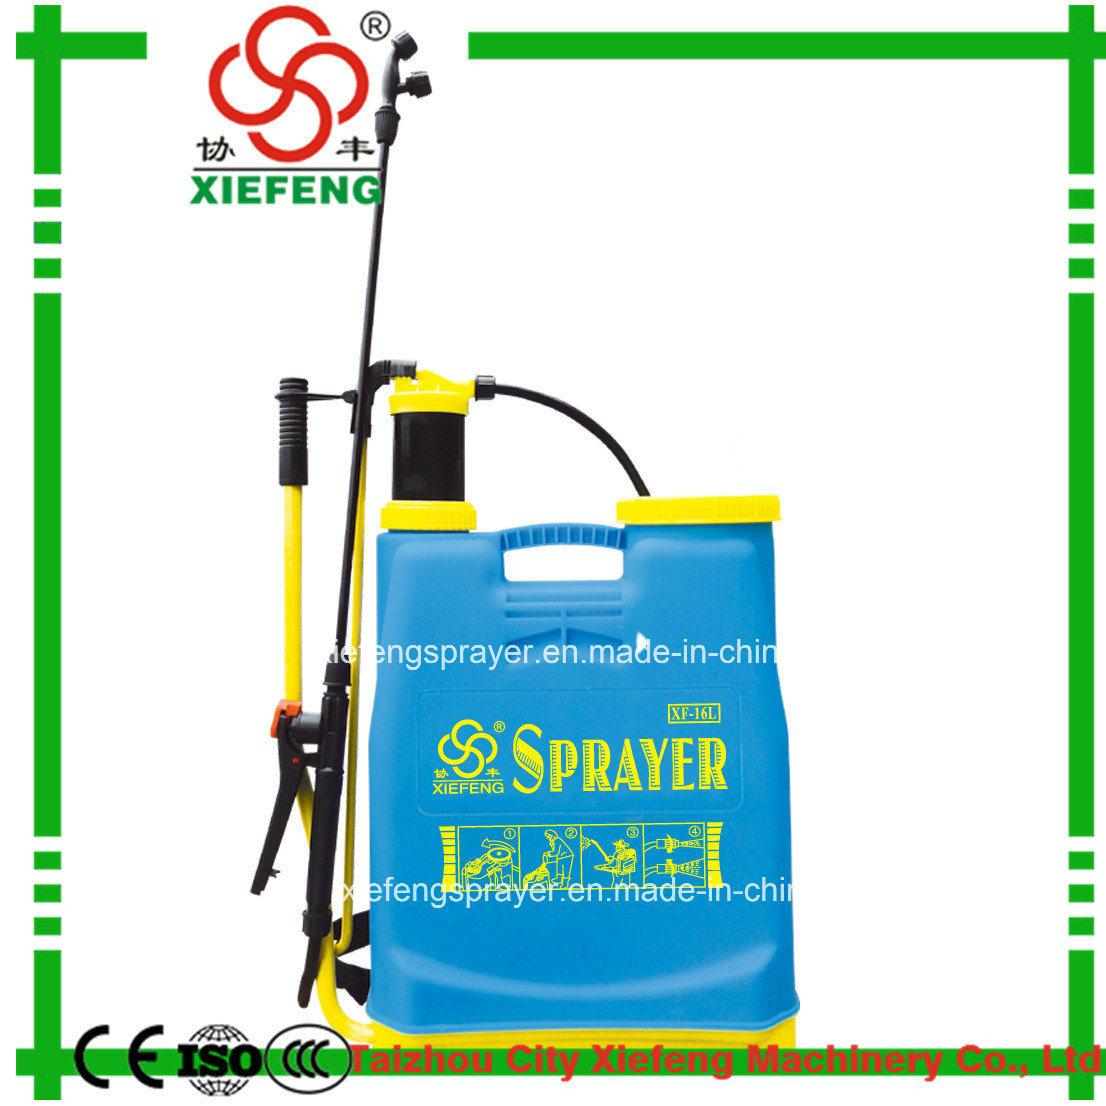 16liter Manual Agricultural Sprayer